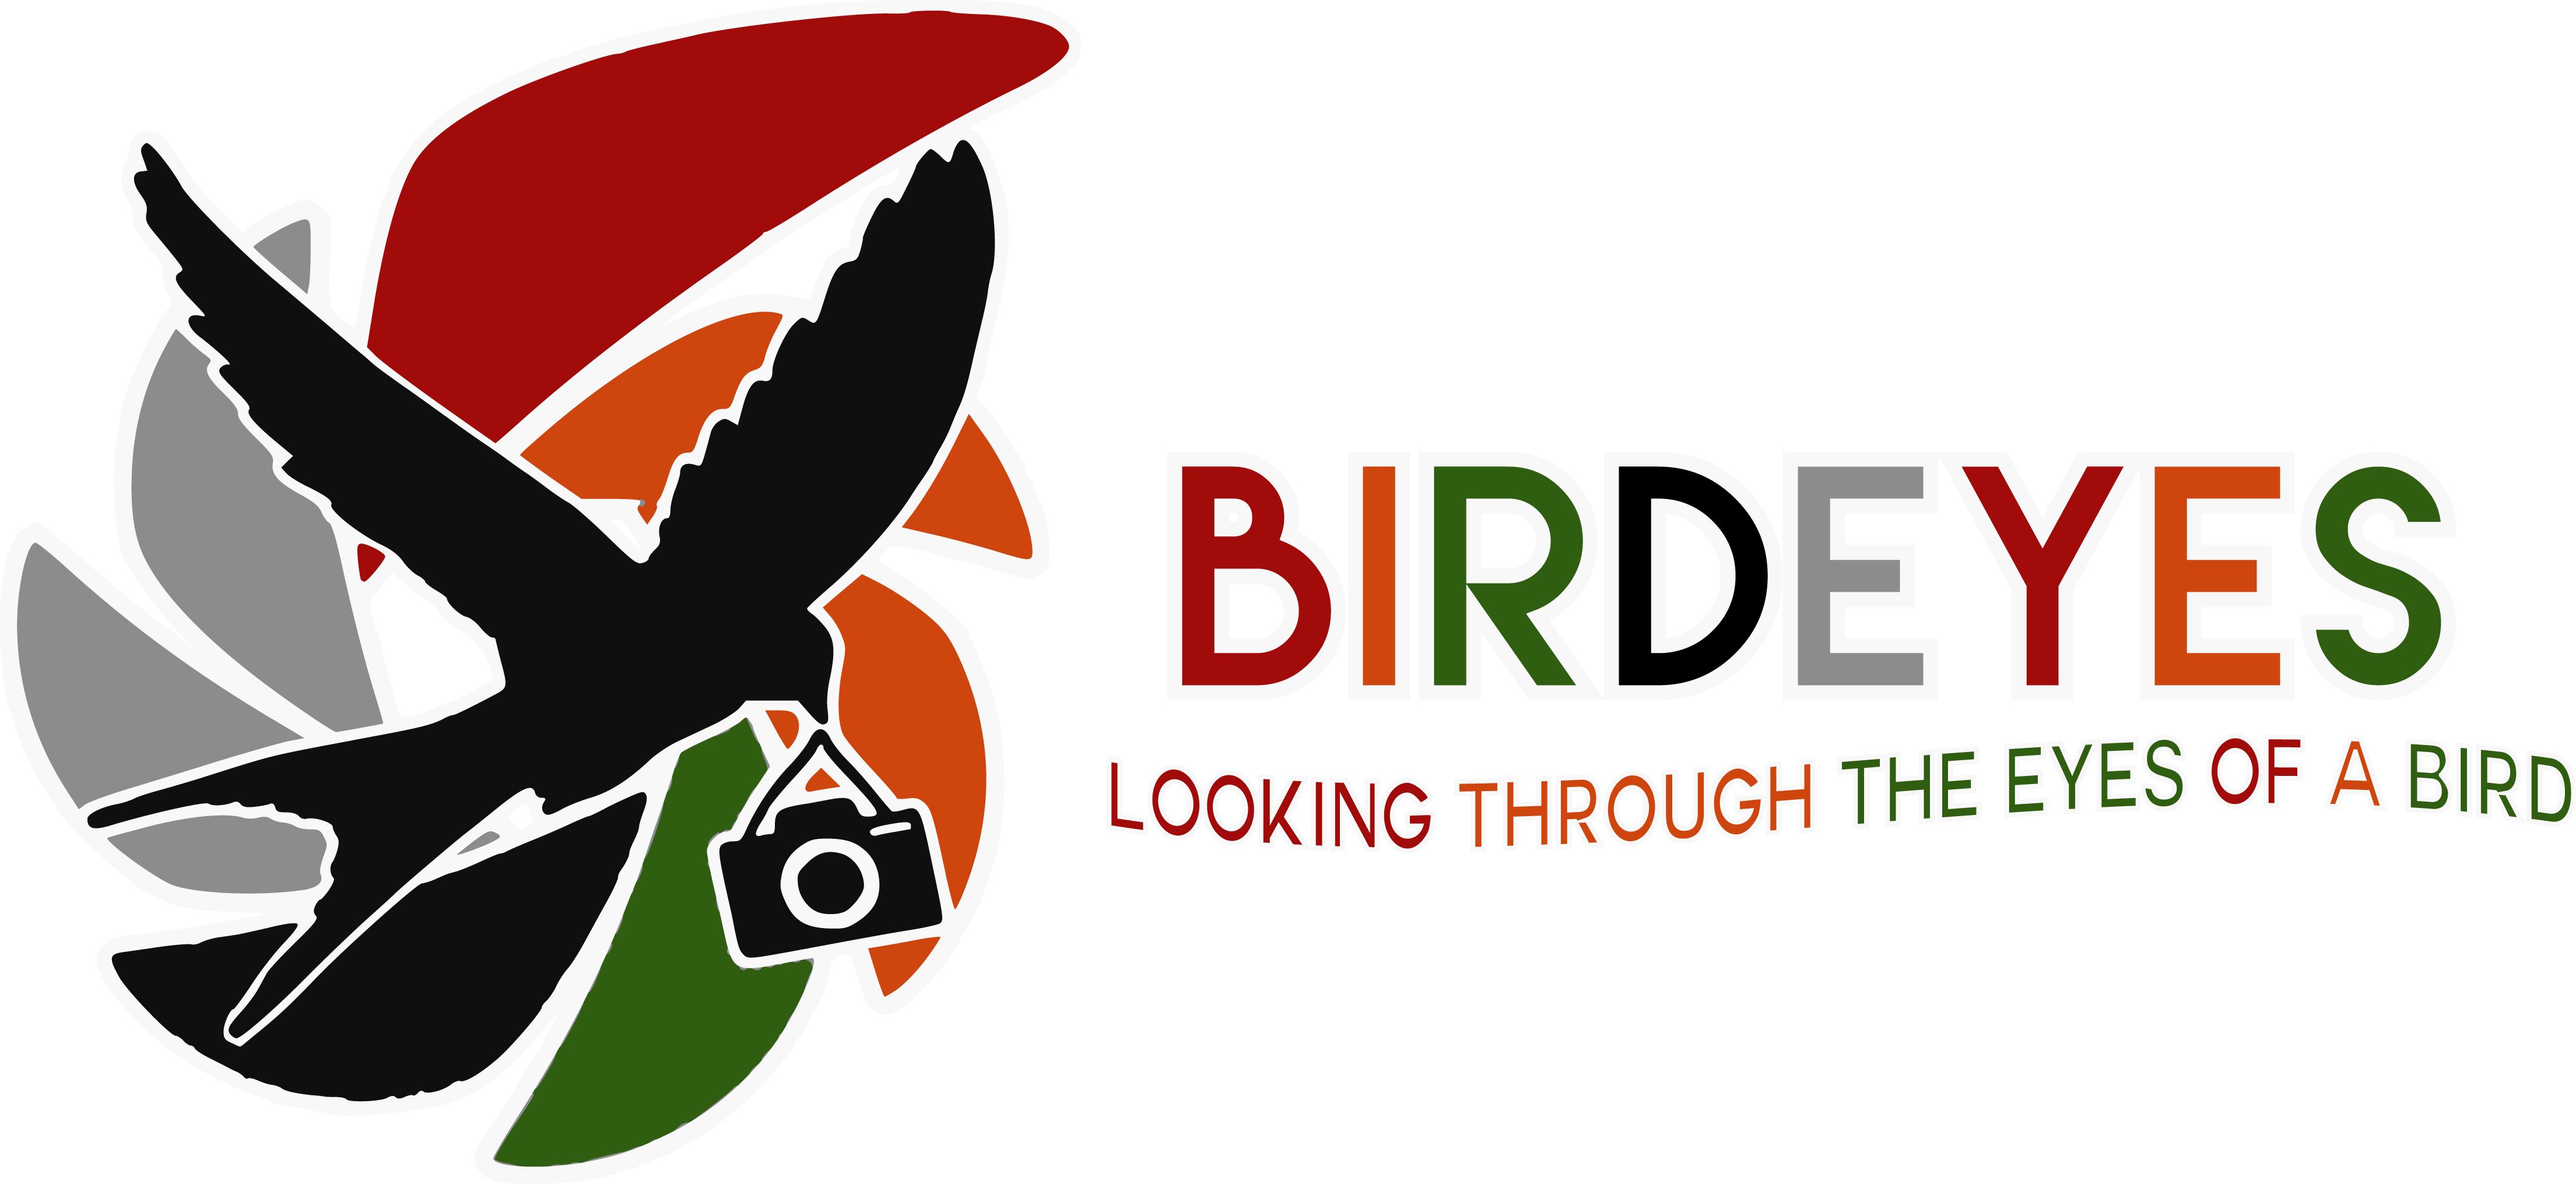 Birdeyes